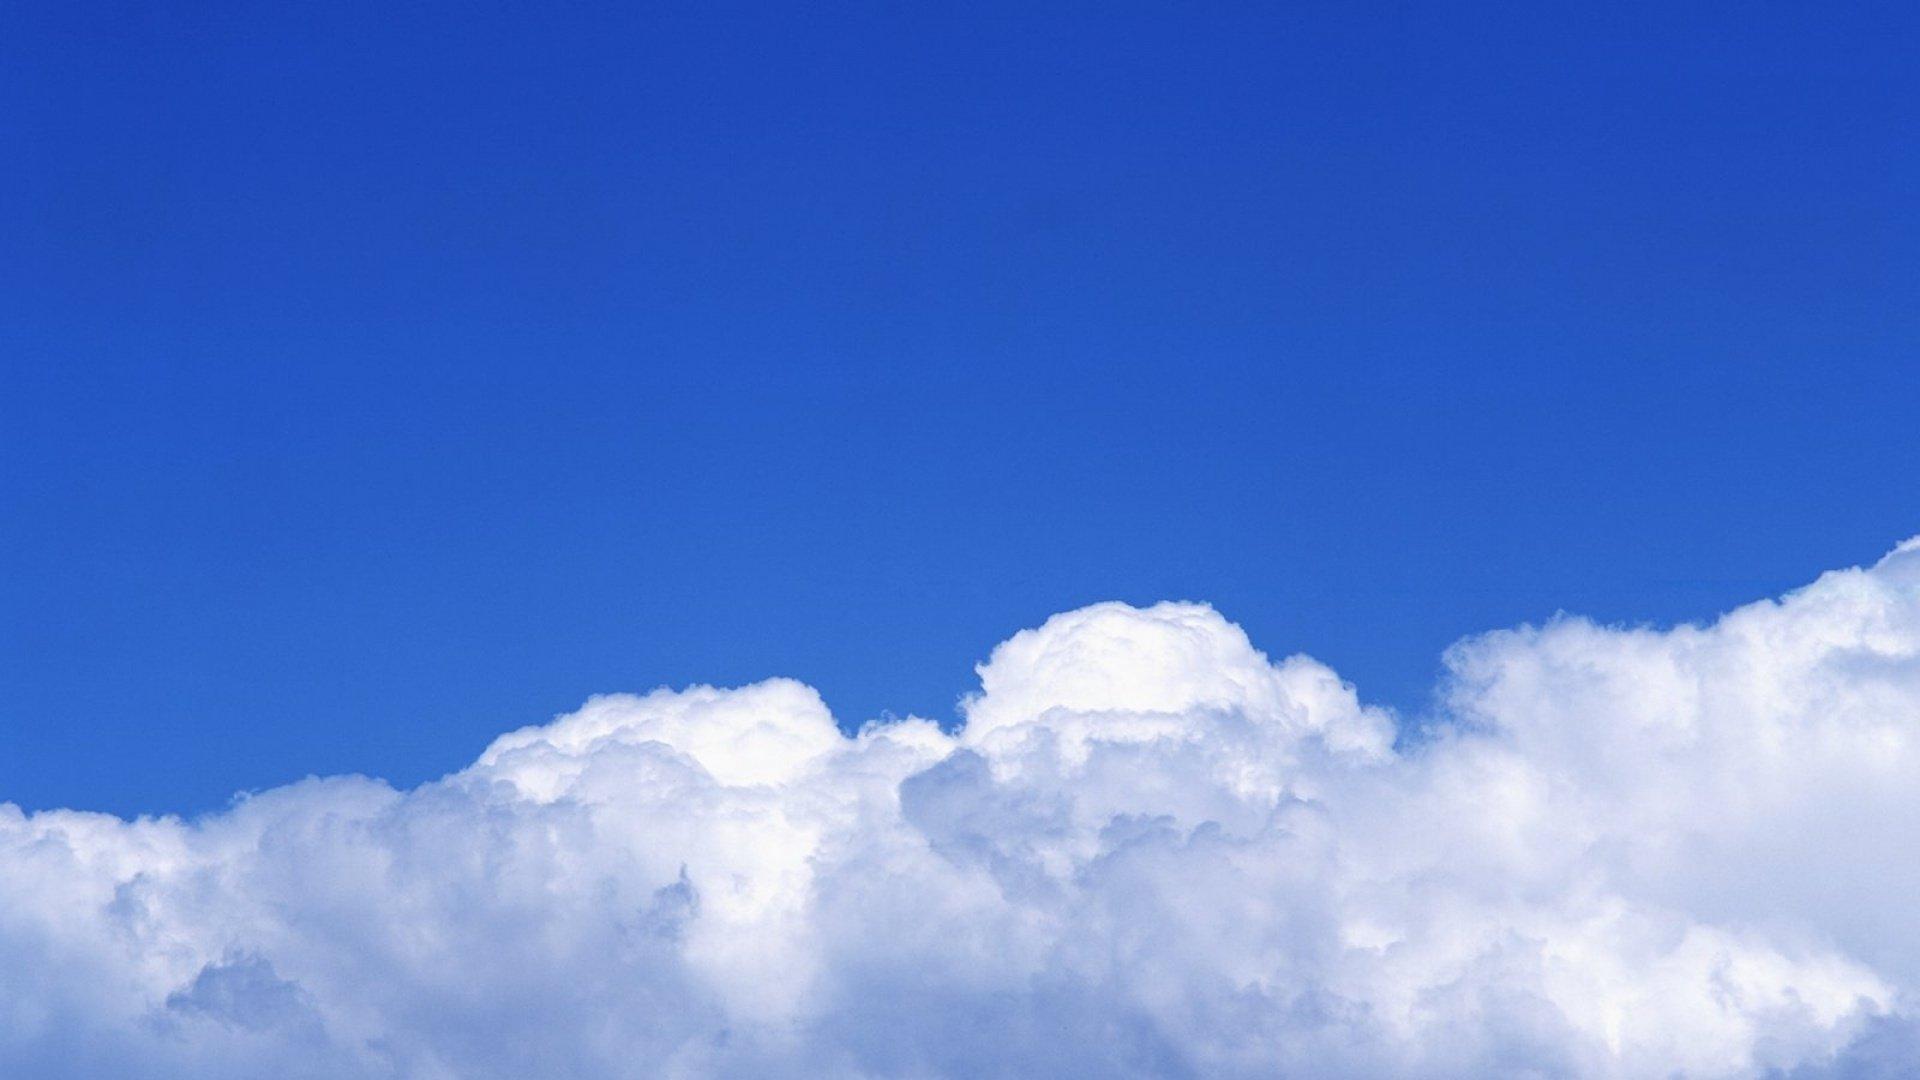 android安卓风景 蓝天白云高清手机壁纸免费下载,安心